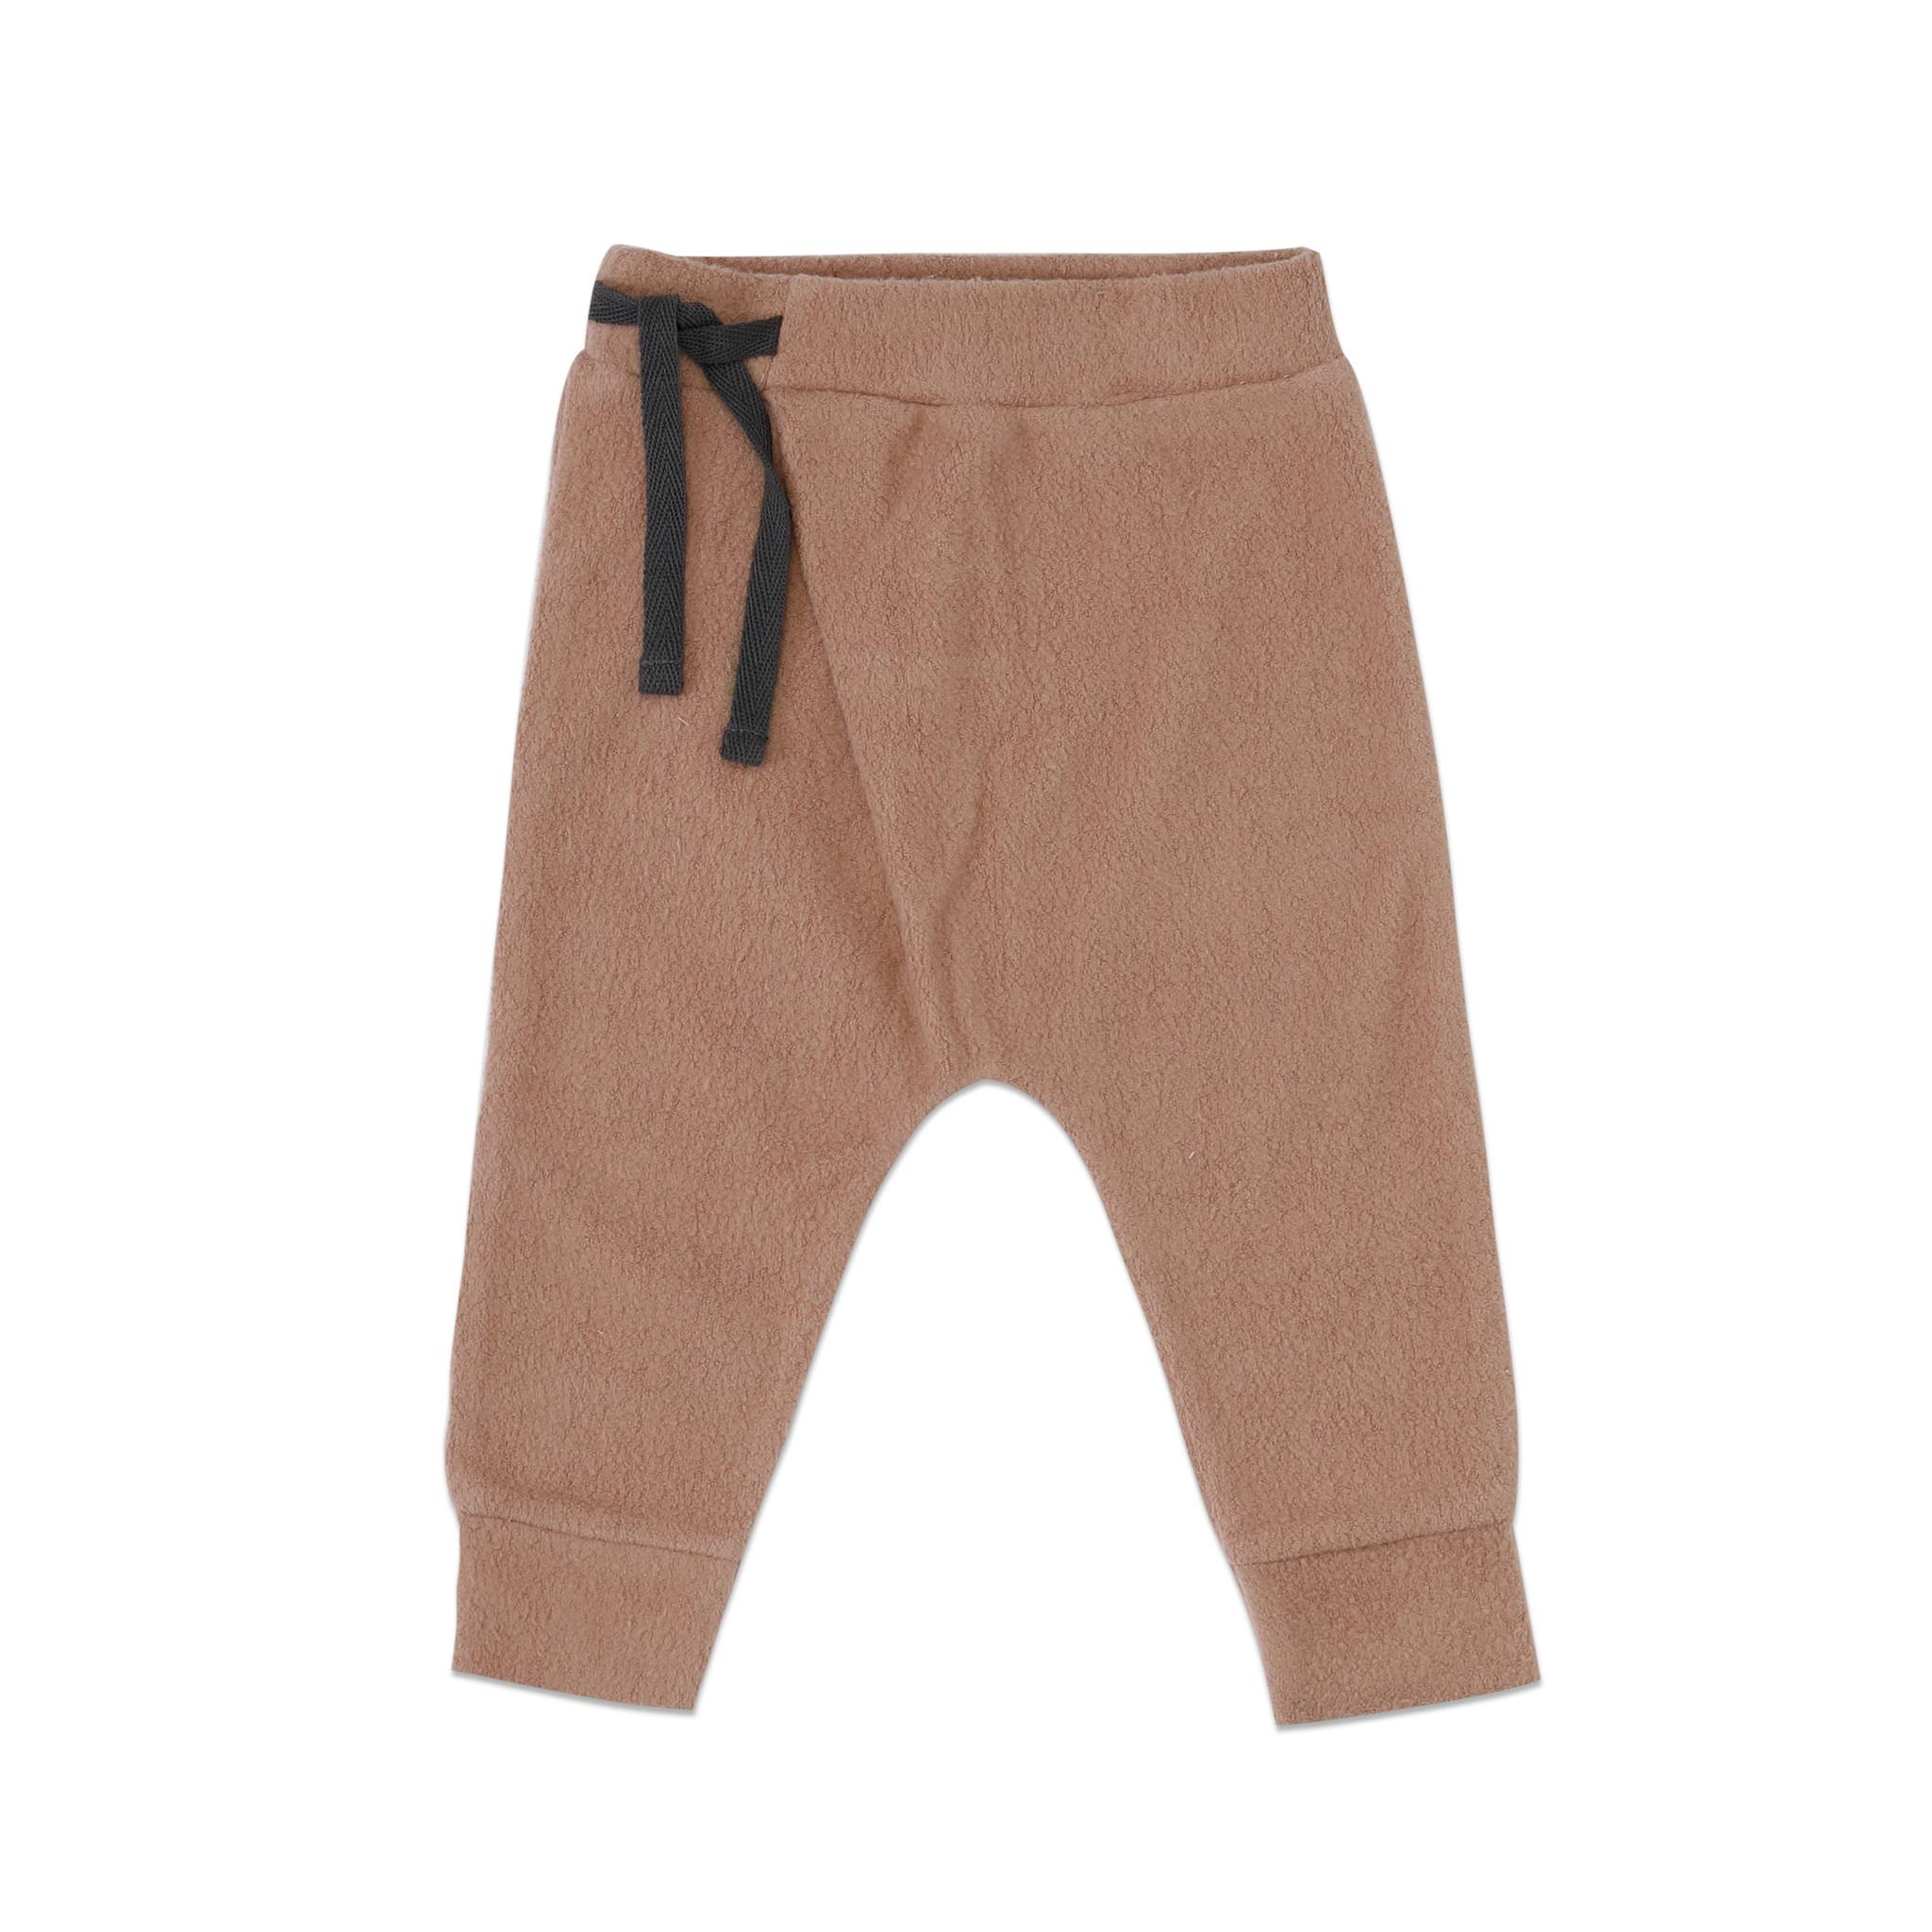 Teddy baby harem pants - creamy mocha-2